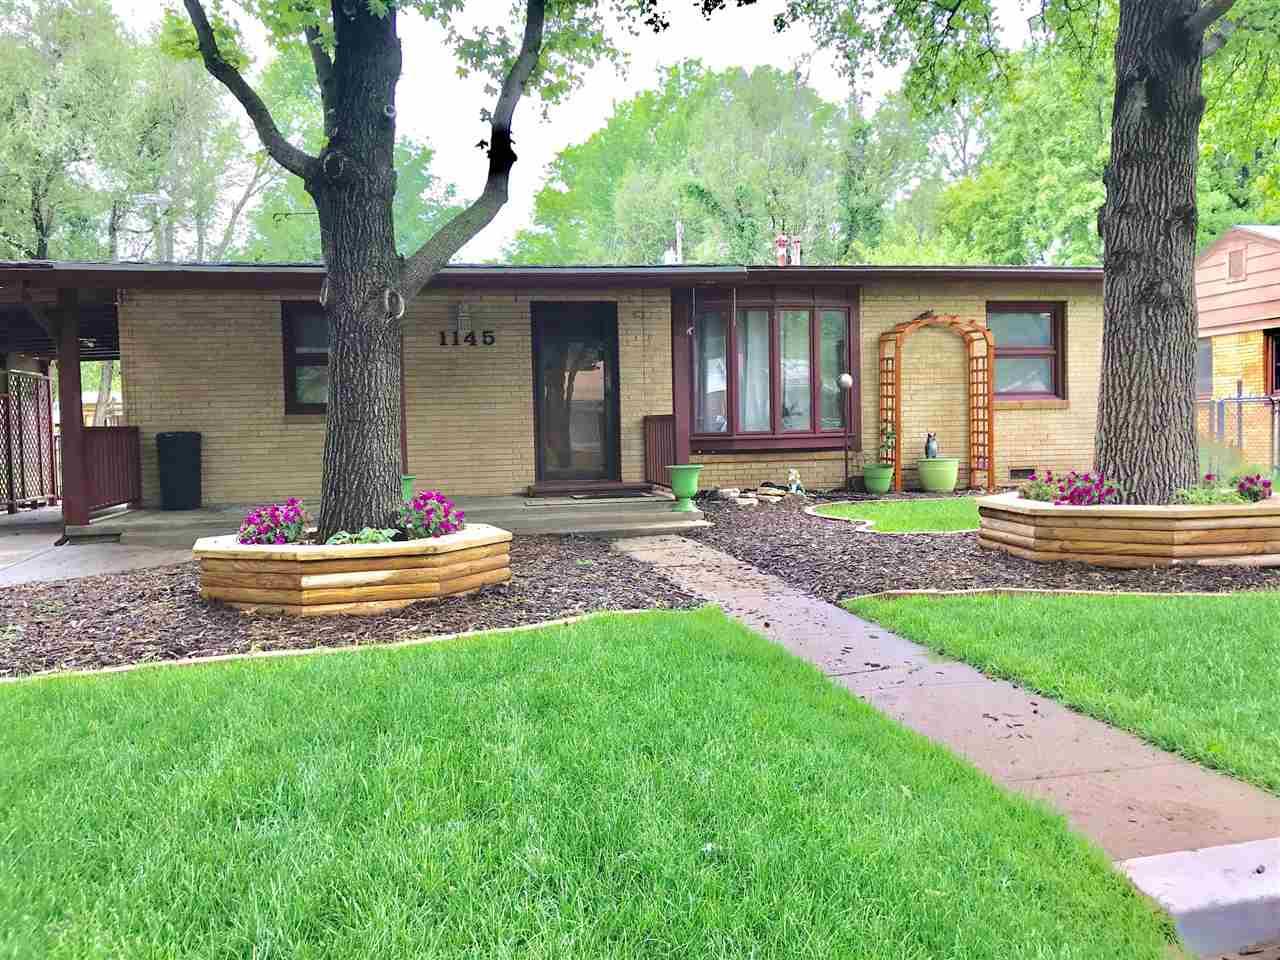 1145 N Lakeview Dr, Derby, KS, 67037